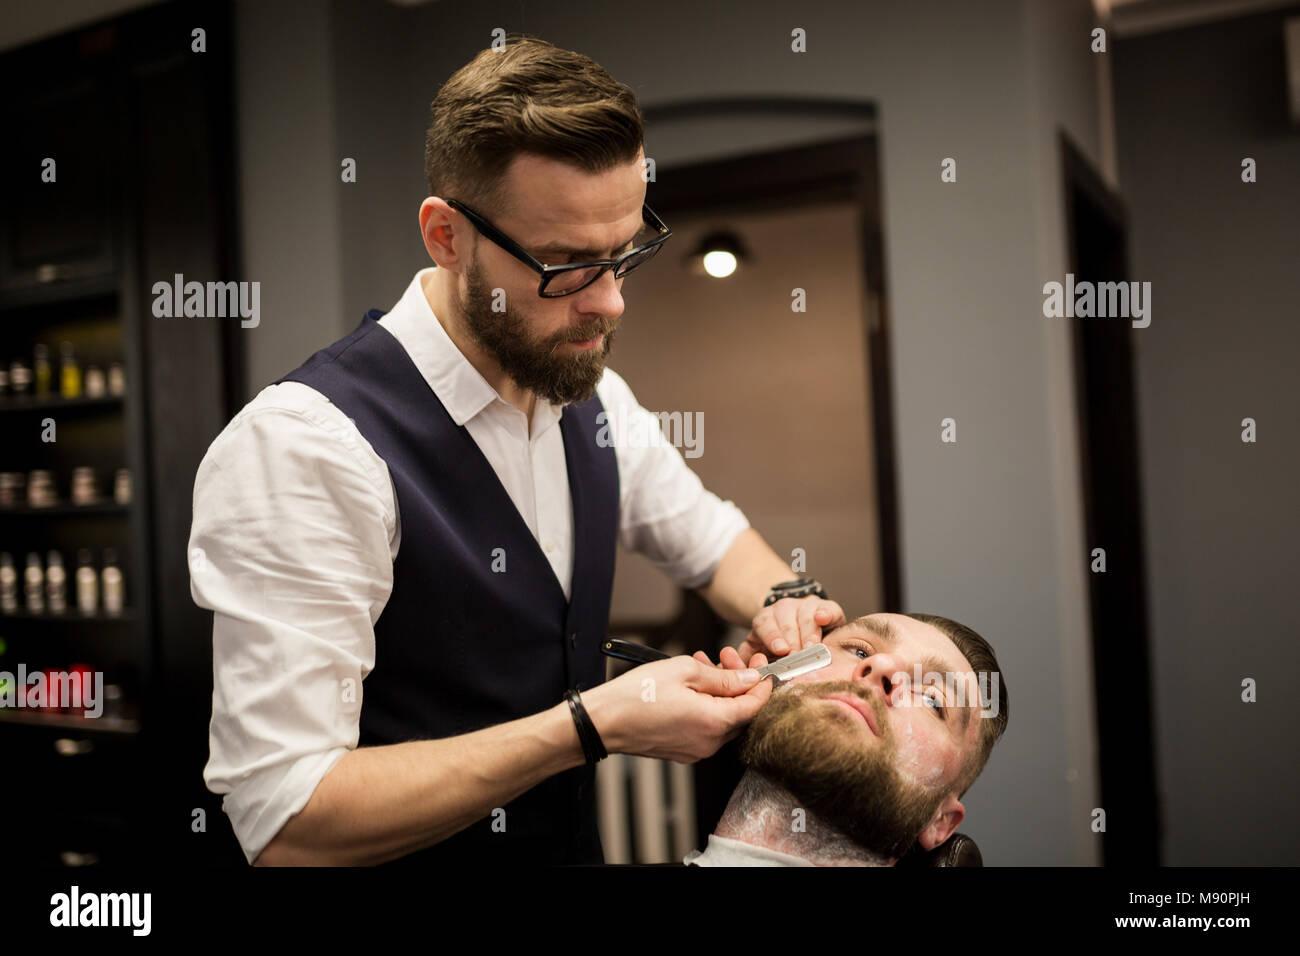 Portrait of barber shaving customer with razor - Stock Image